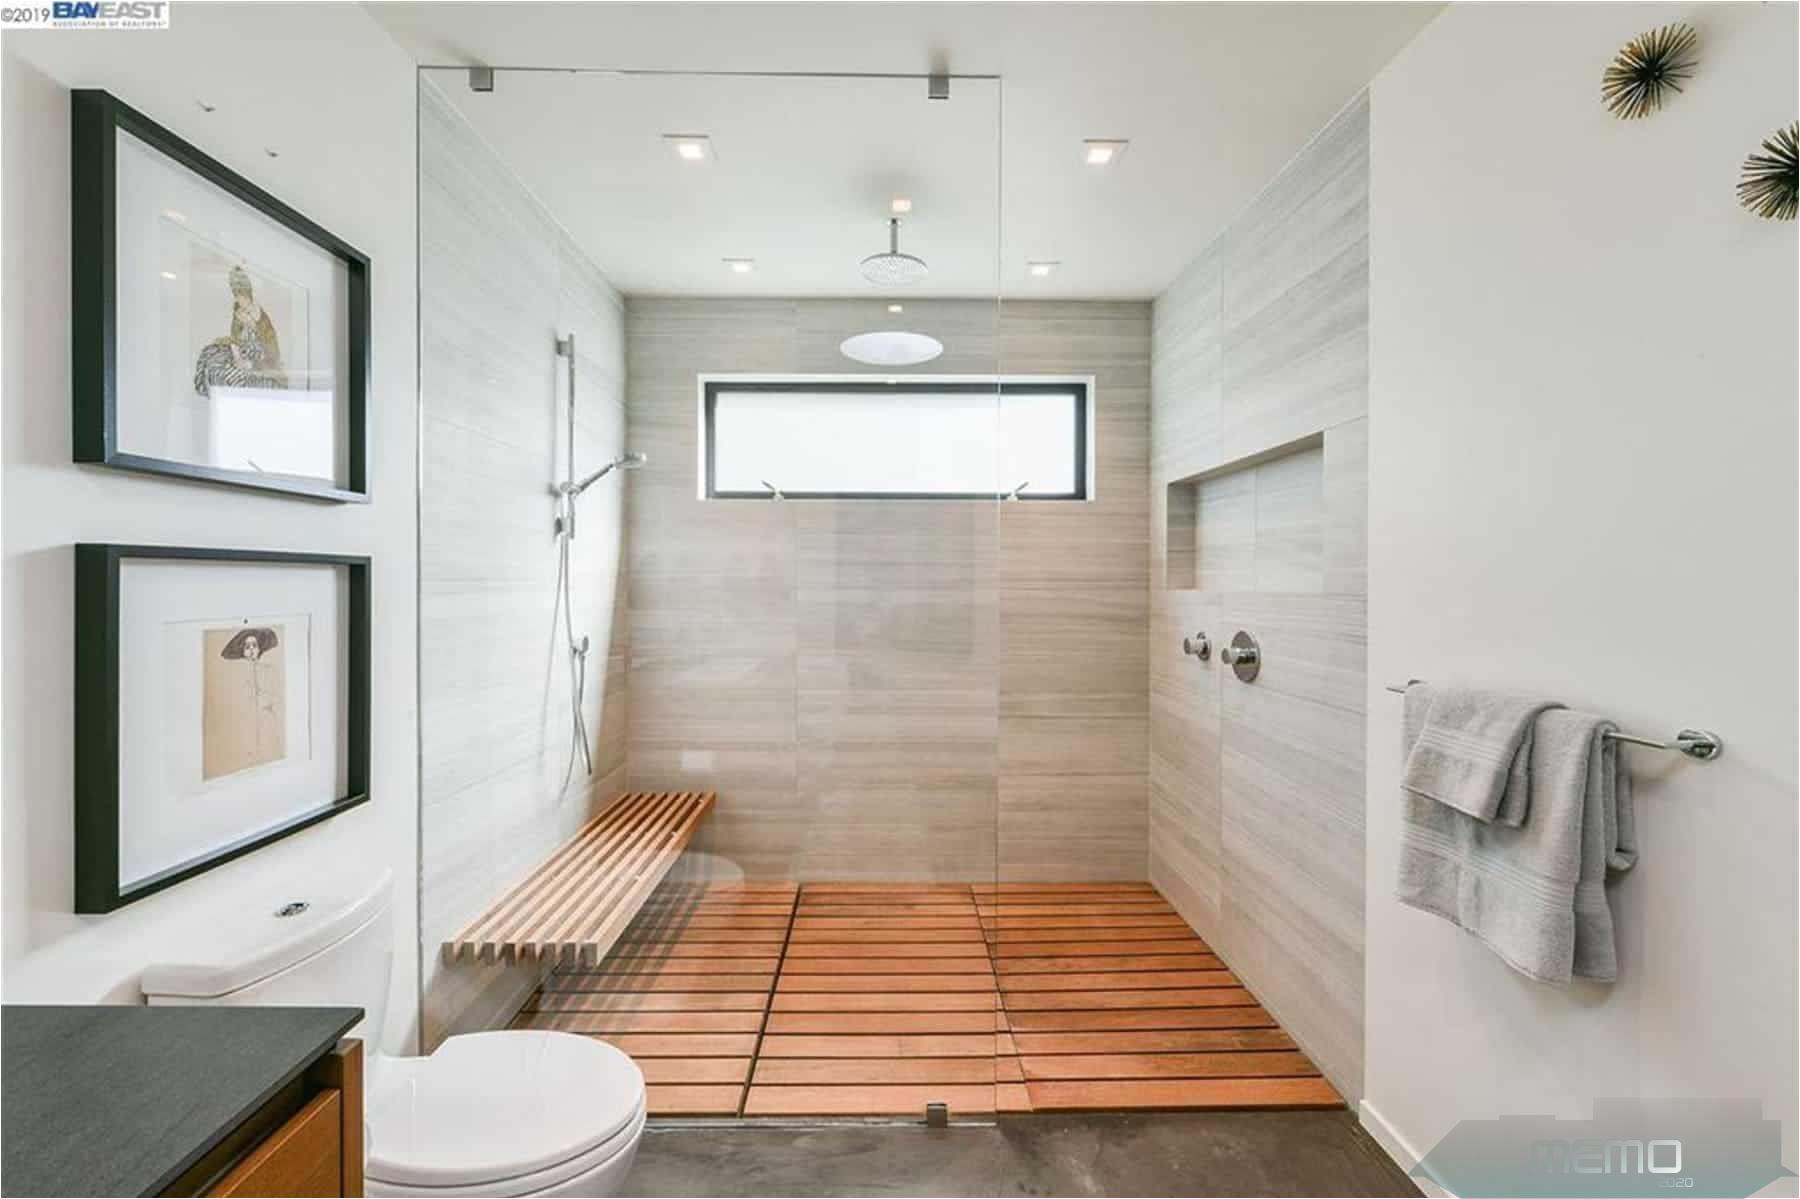 Specs: Bedrooms: 3 Bathrooms: 2.5 Sq. Ft.: 2,377 Year Built: 2016 Source: Hom